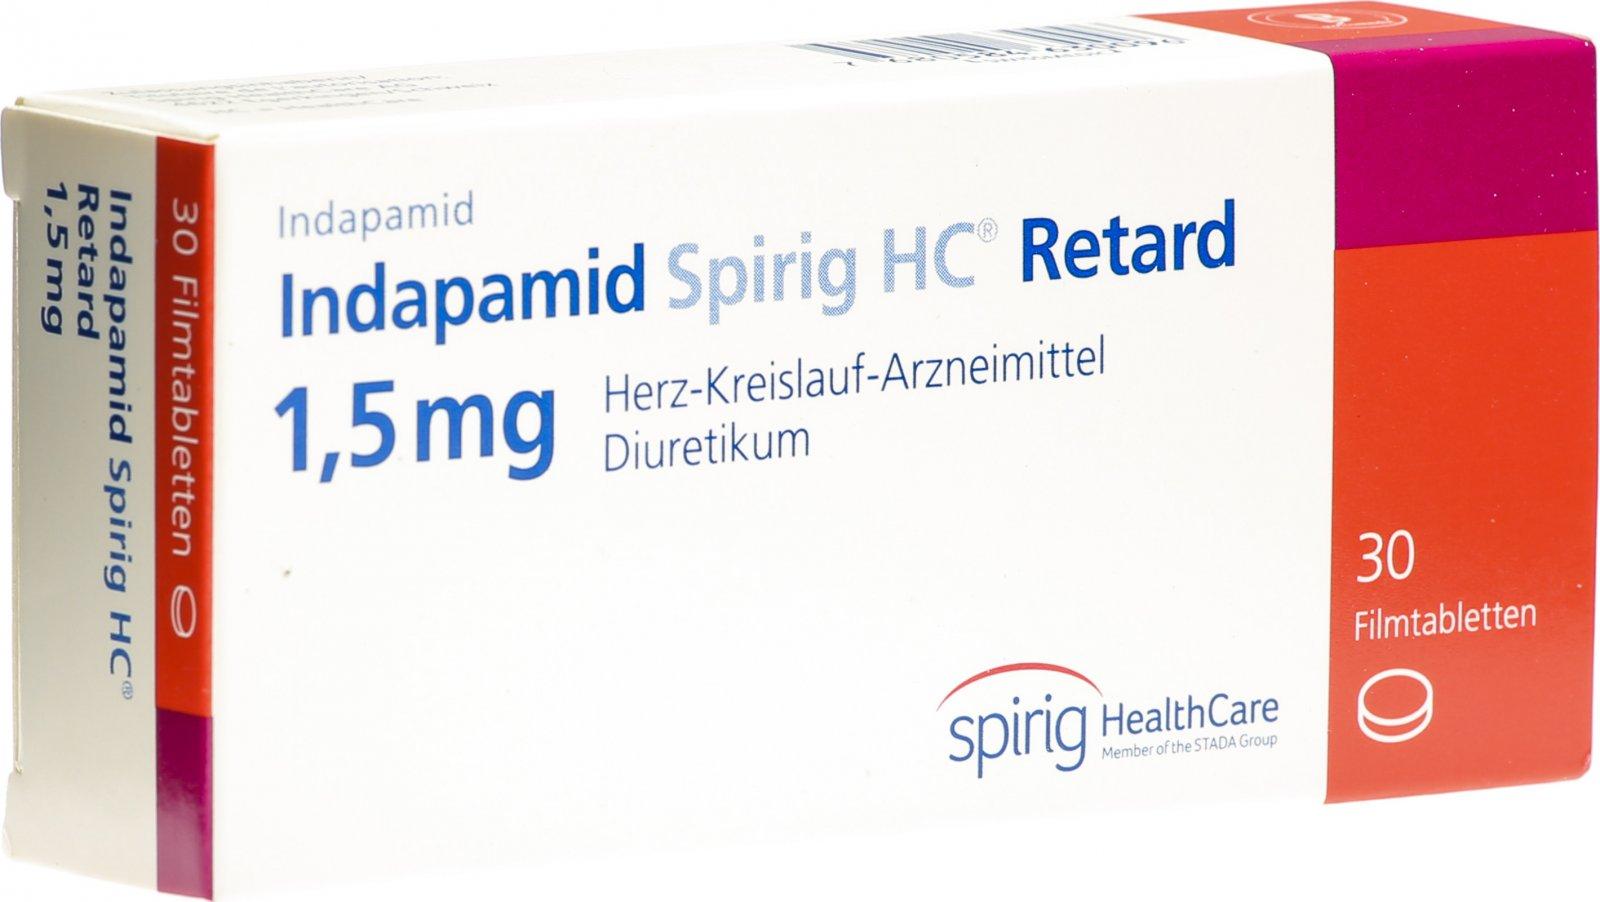 Indapamid Spirig HC Retard Filmtabletten 20.20mg 20 Stück in der ...